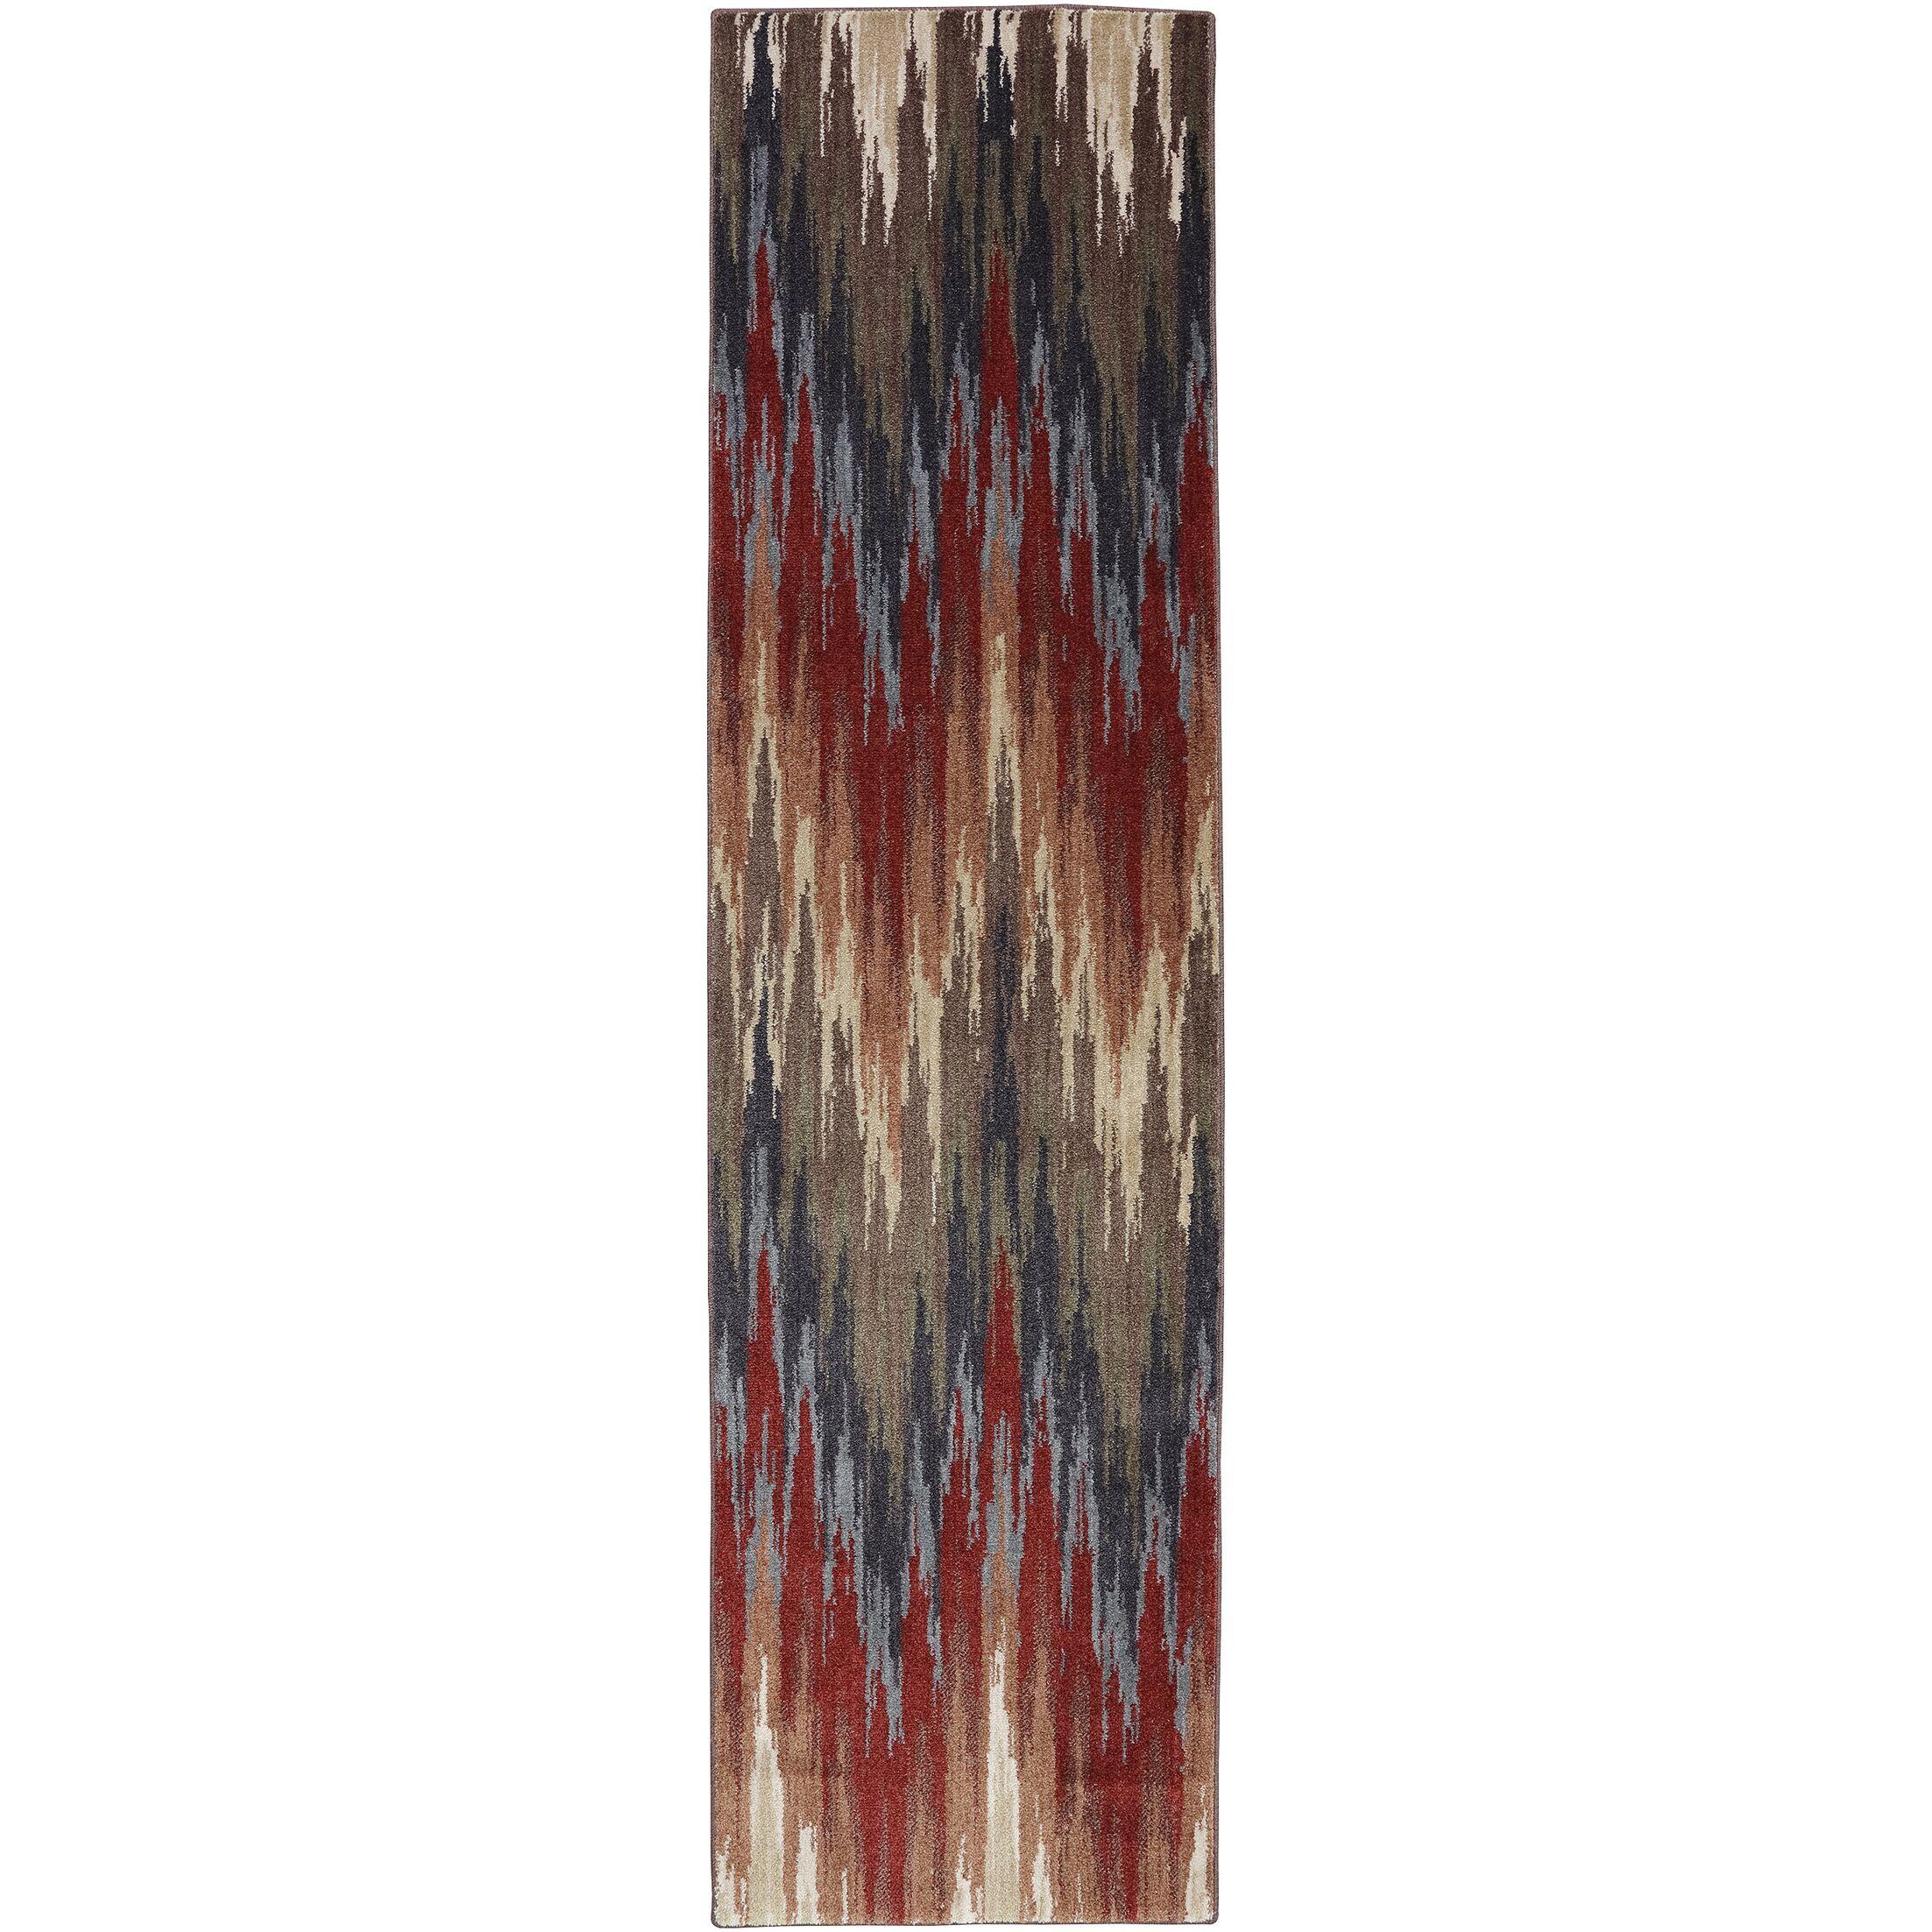 Dryden Mesquite Abstract Big Horn Rug Rug Size: Runner 2'1